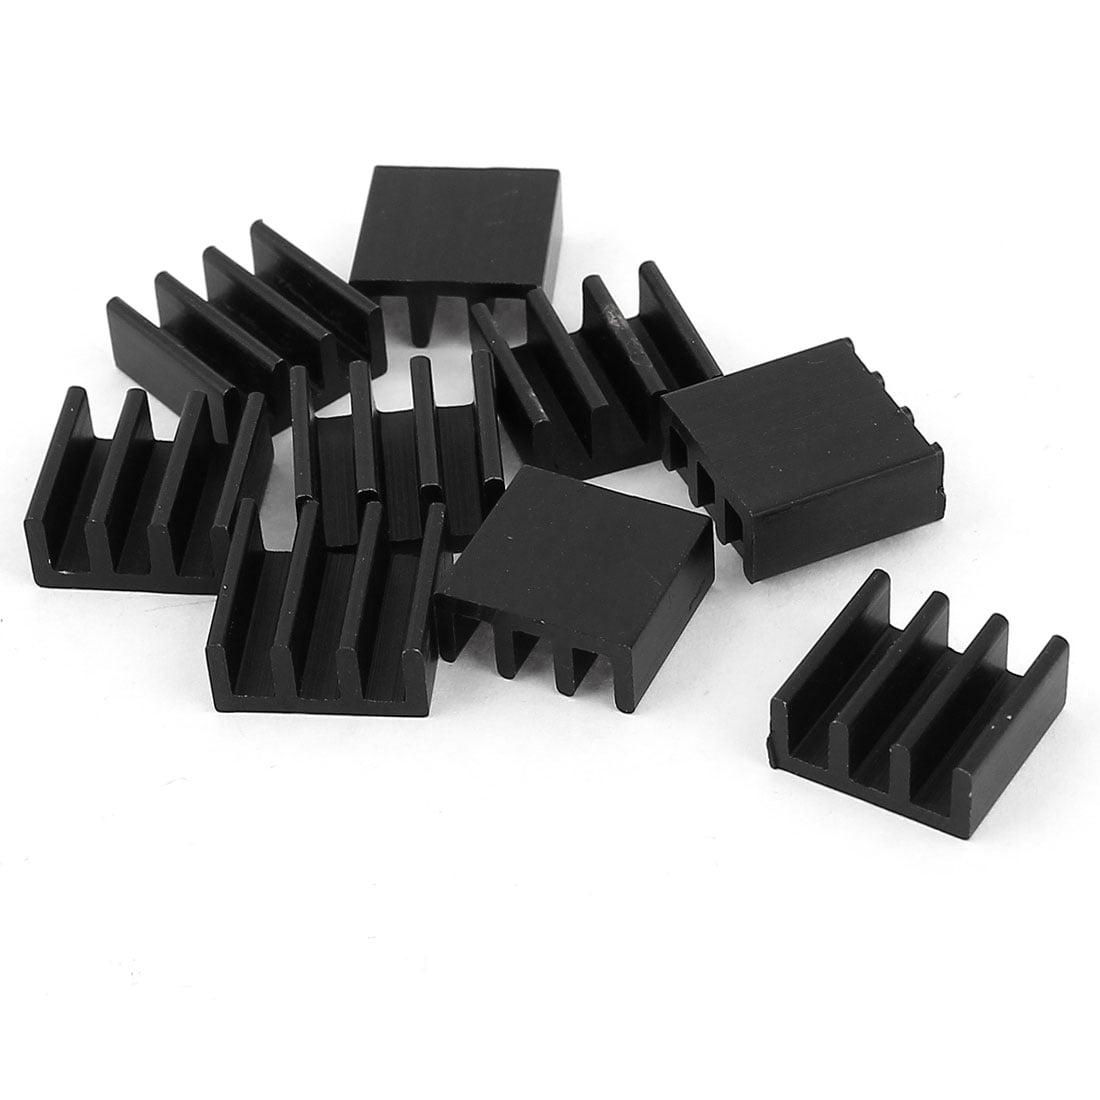 10 Pieces Black Aluminum Cooler Radiator Heat Sink Heatsink 11mm x 11mm x 5mm